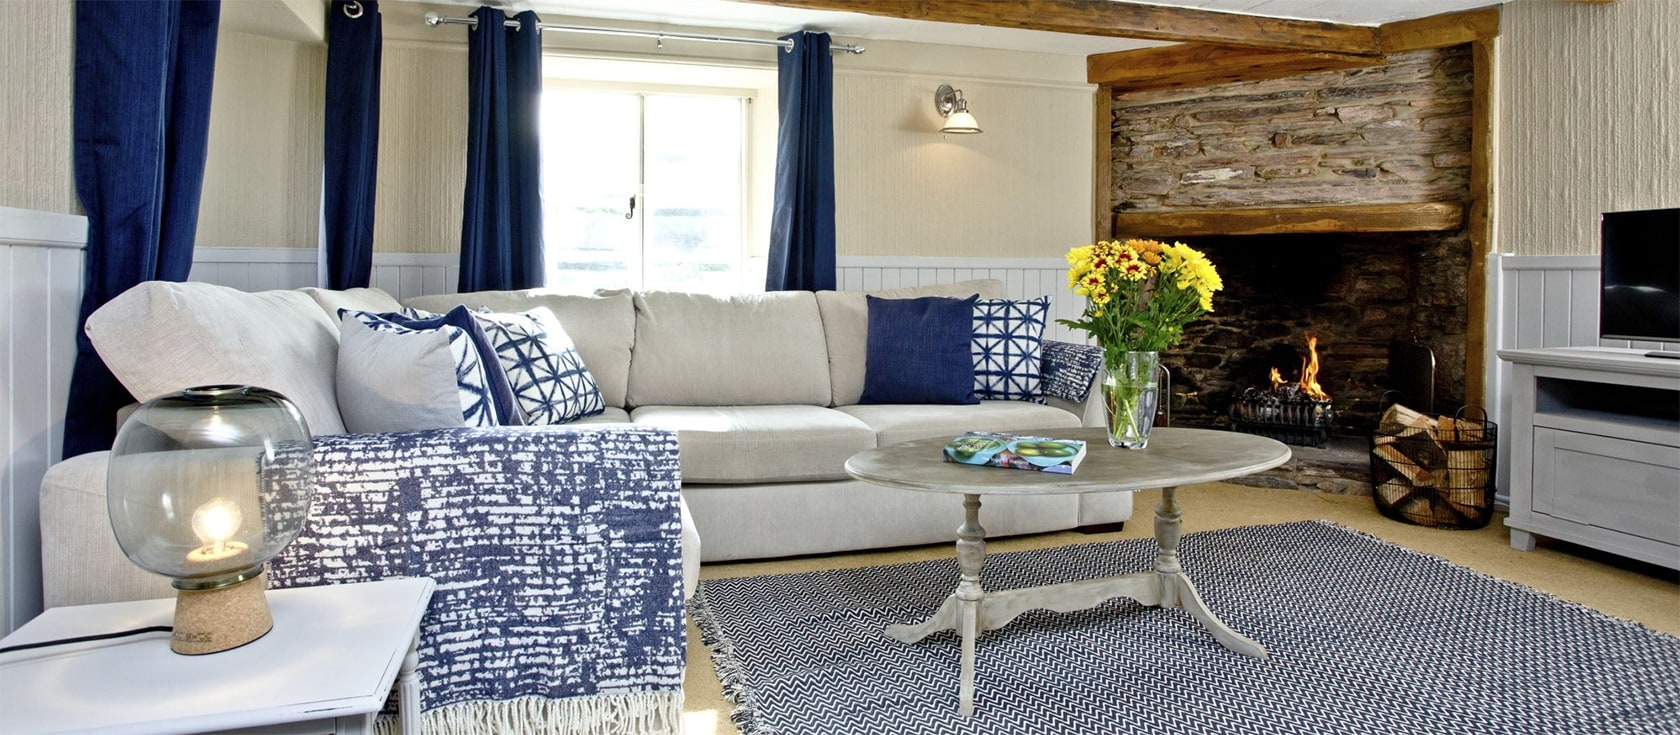 Evies Cottage, Higher Brixham